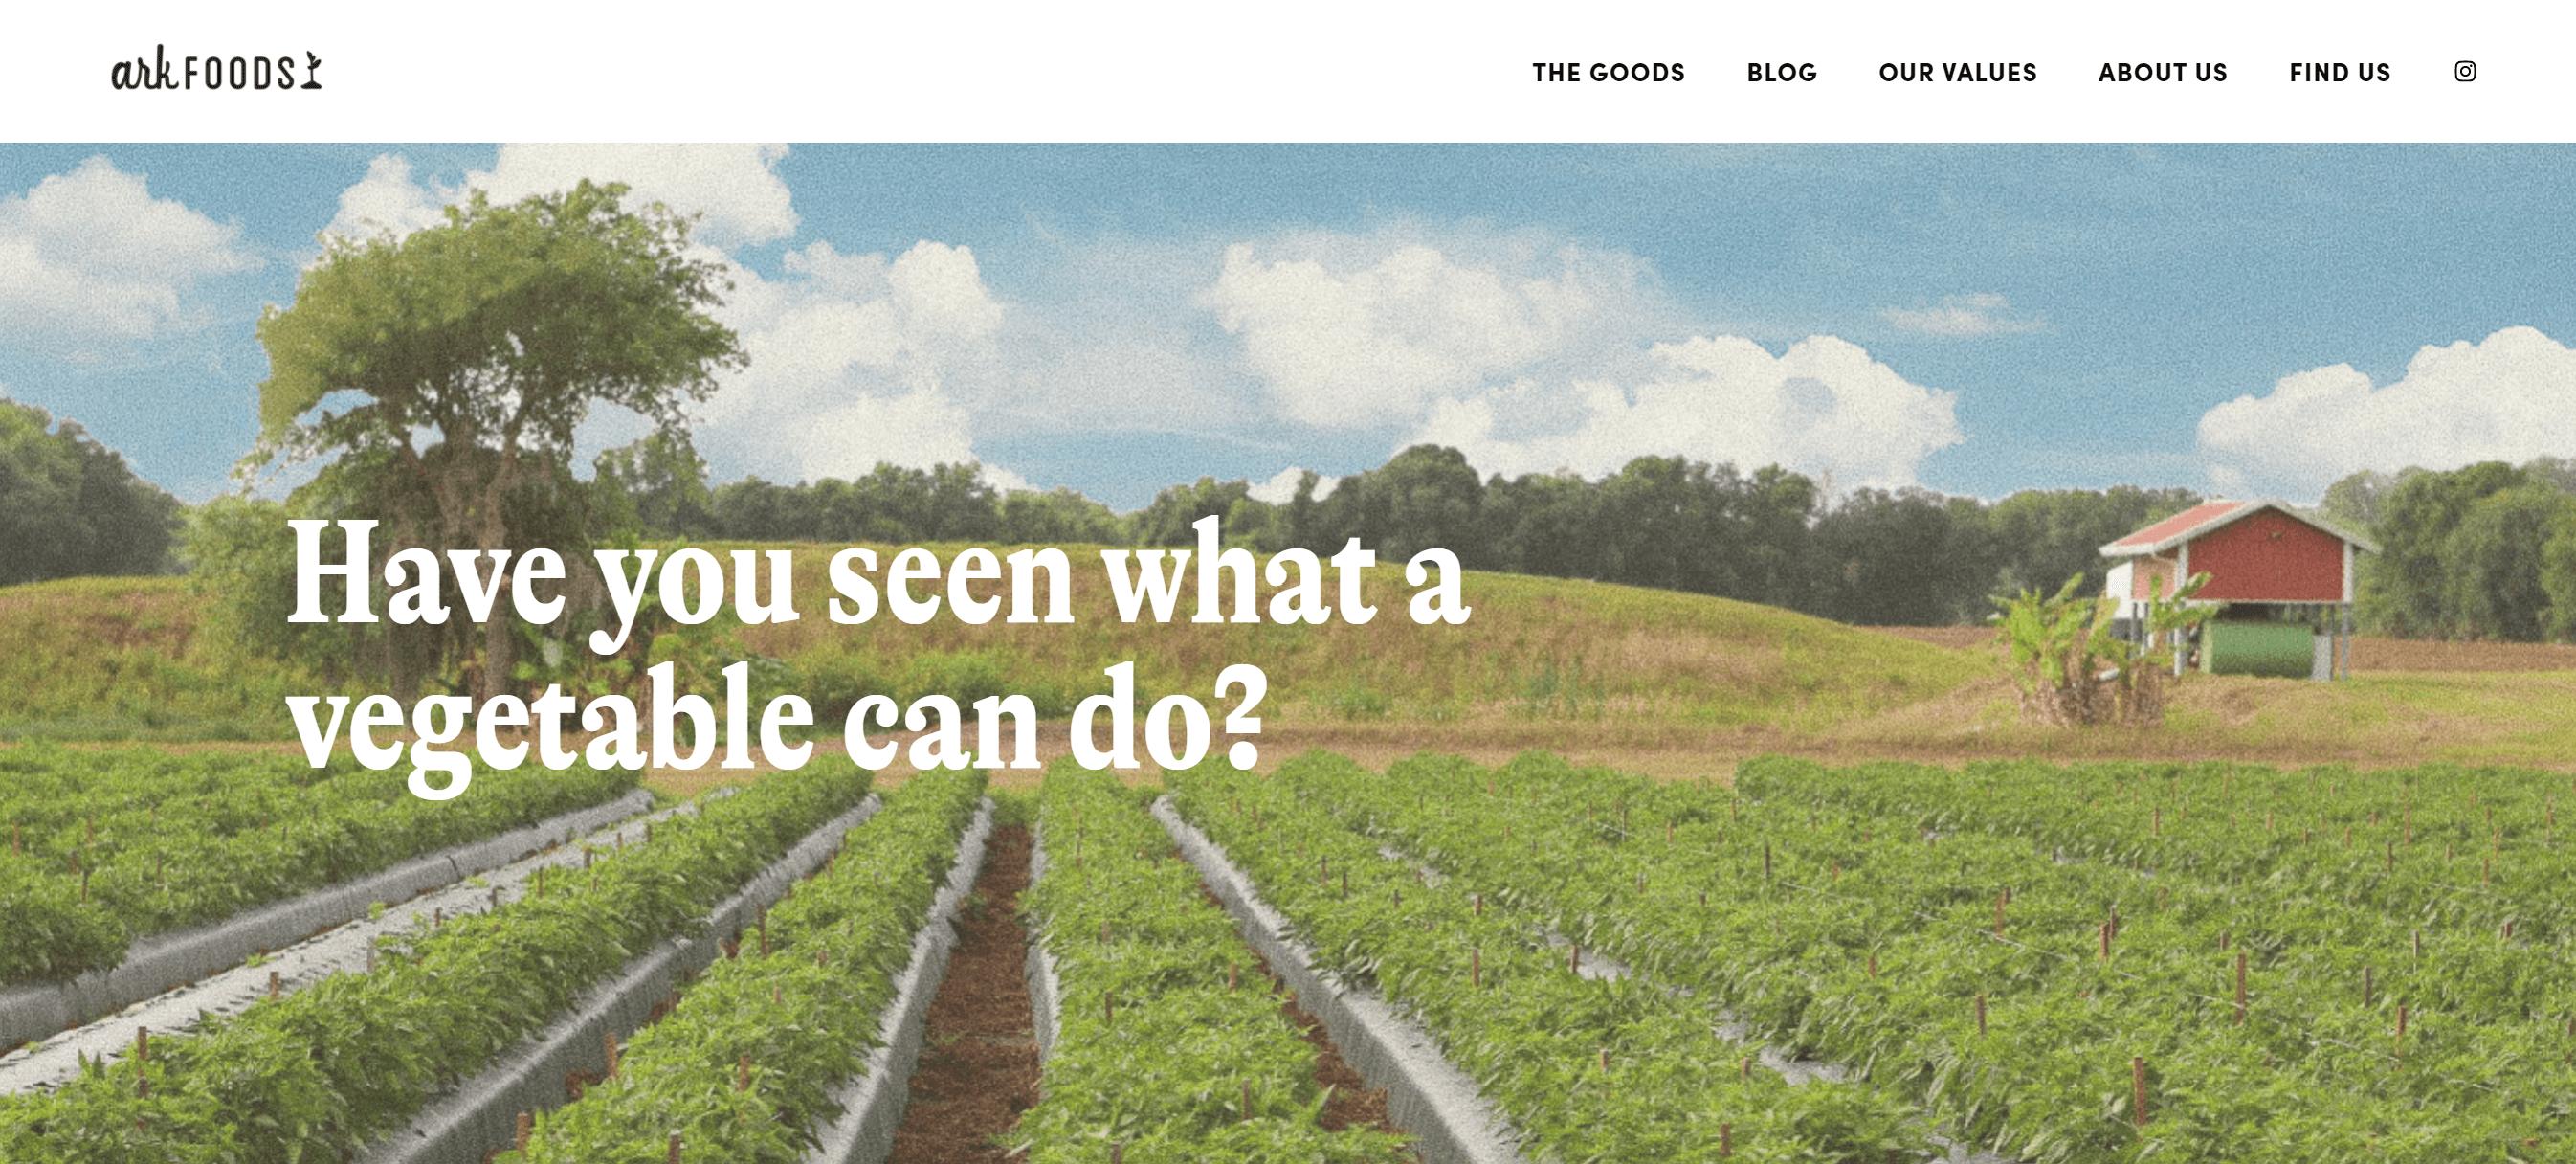 Ark Foods Launches New Website Celebrating Vegetables